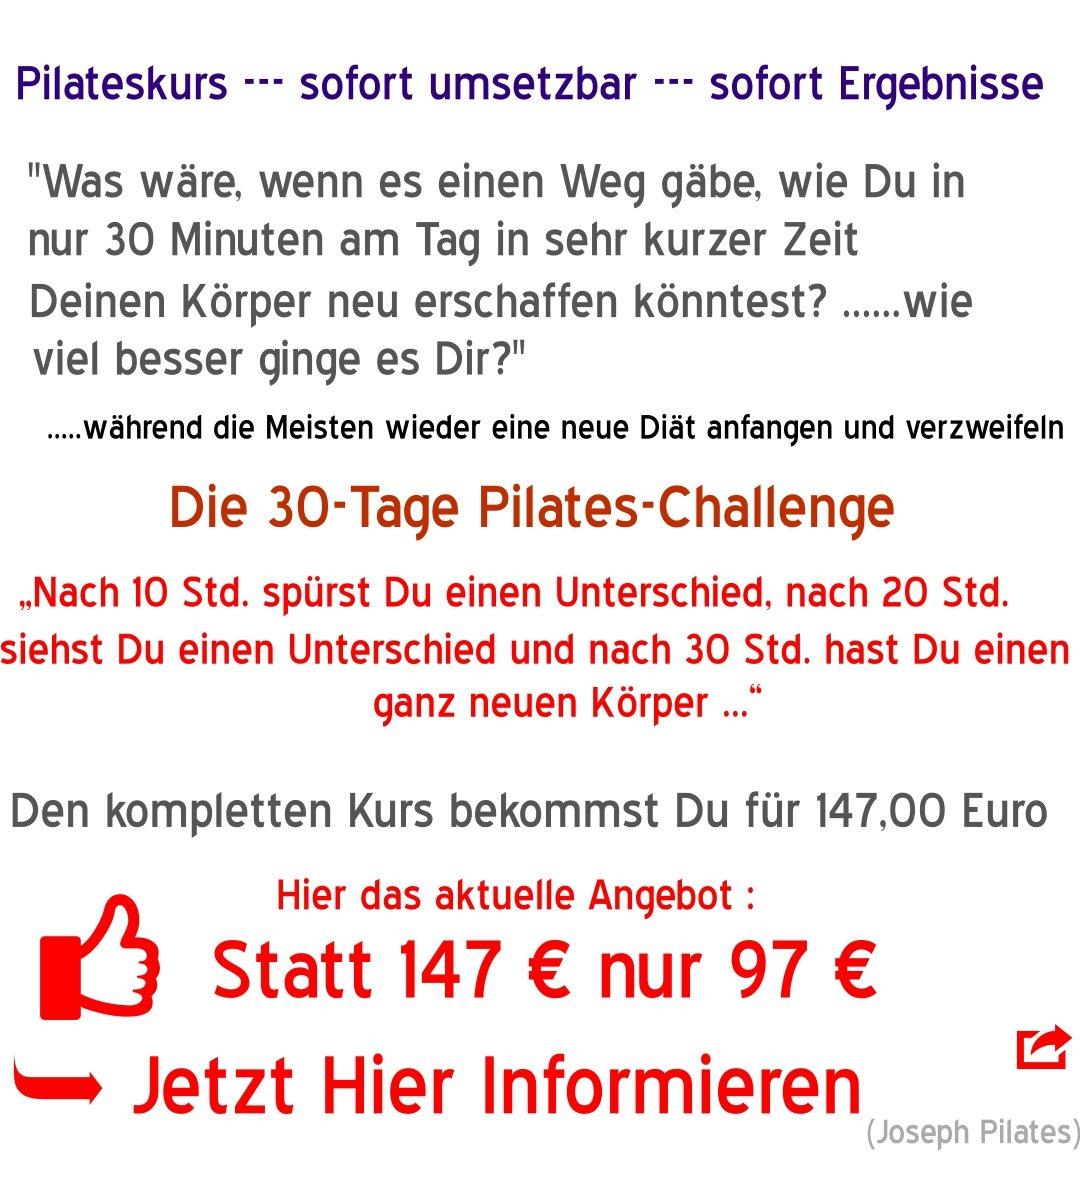 Pilateskurs 30-Tage Pilates-Challenge